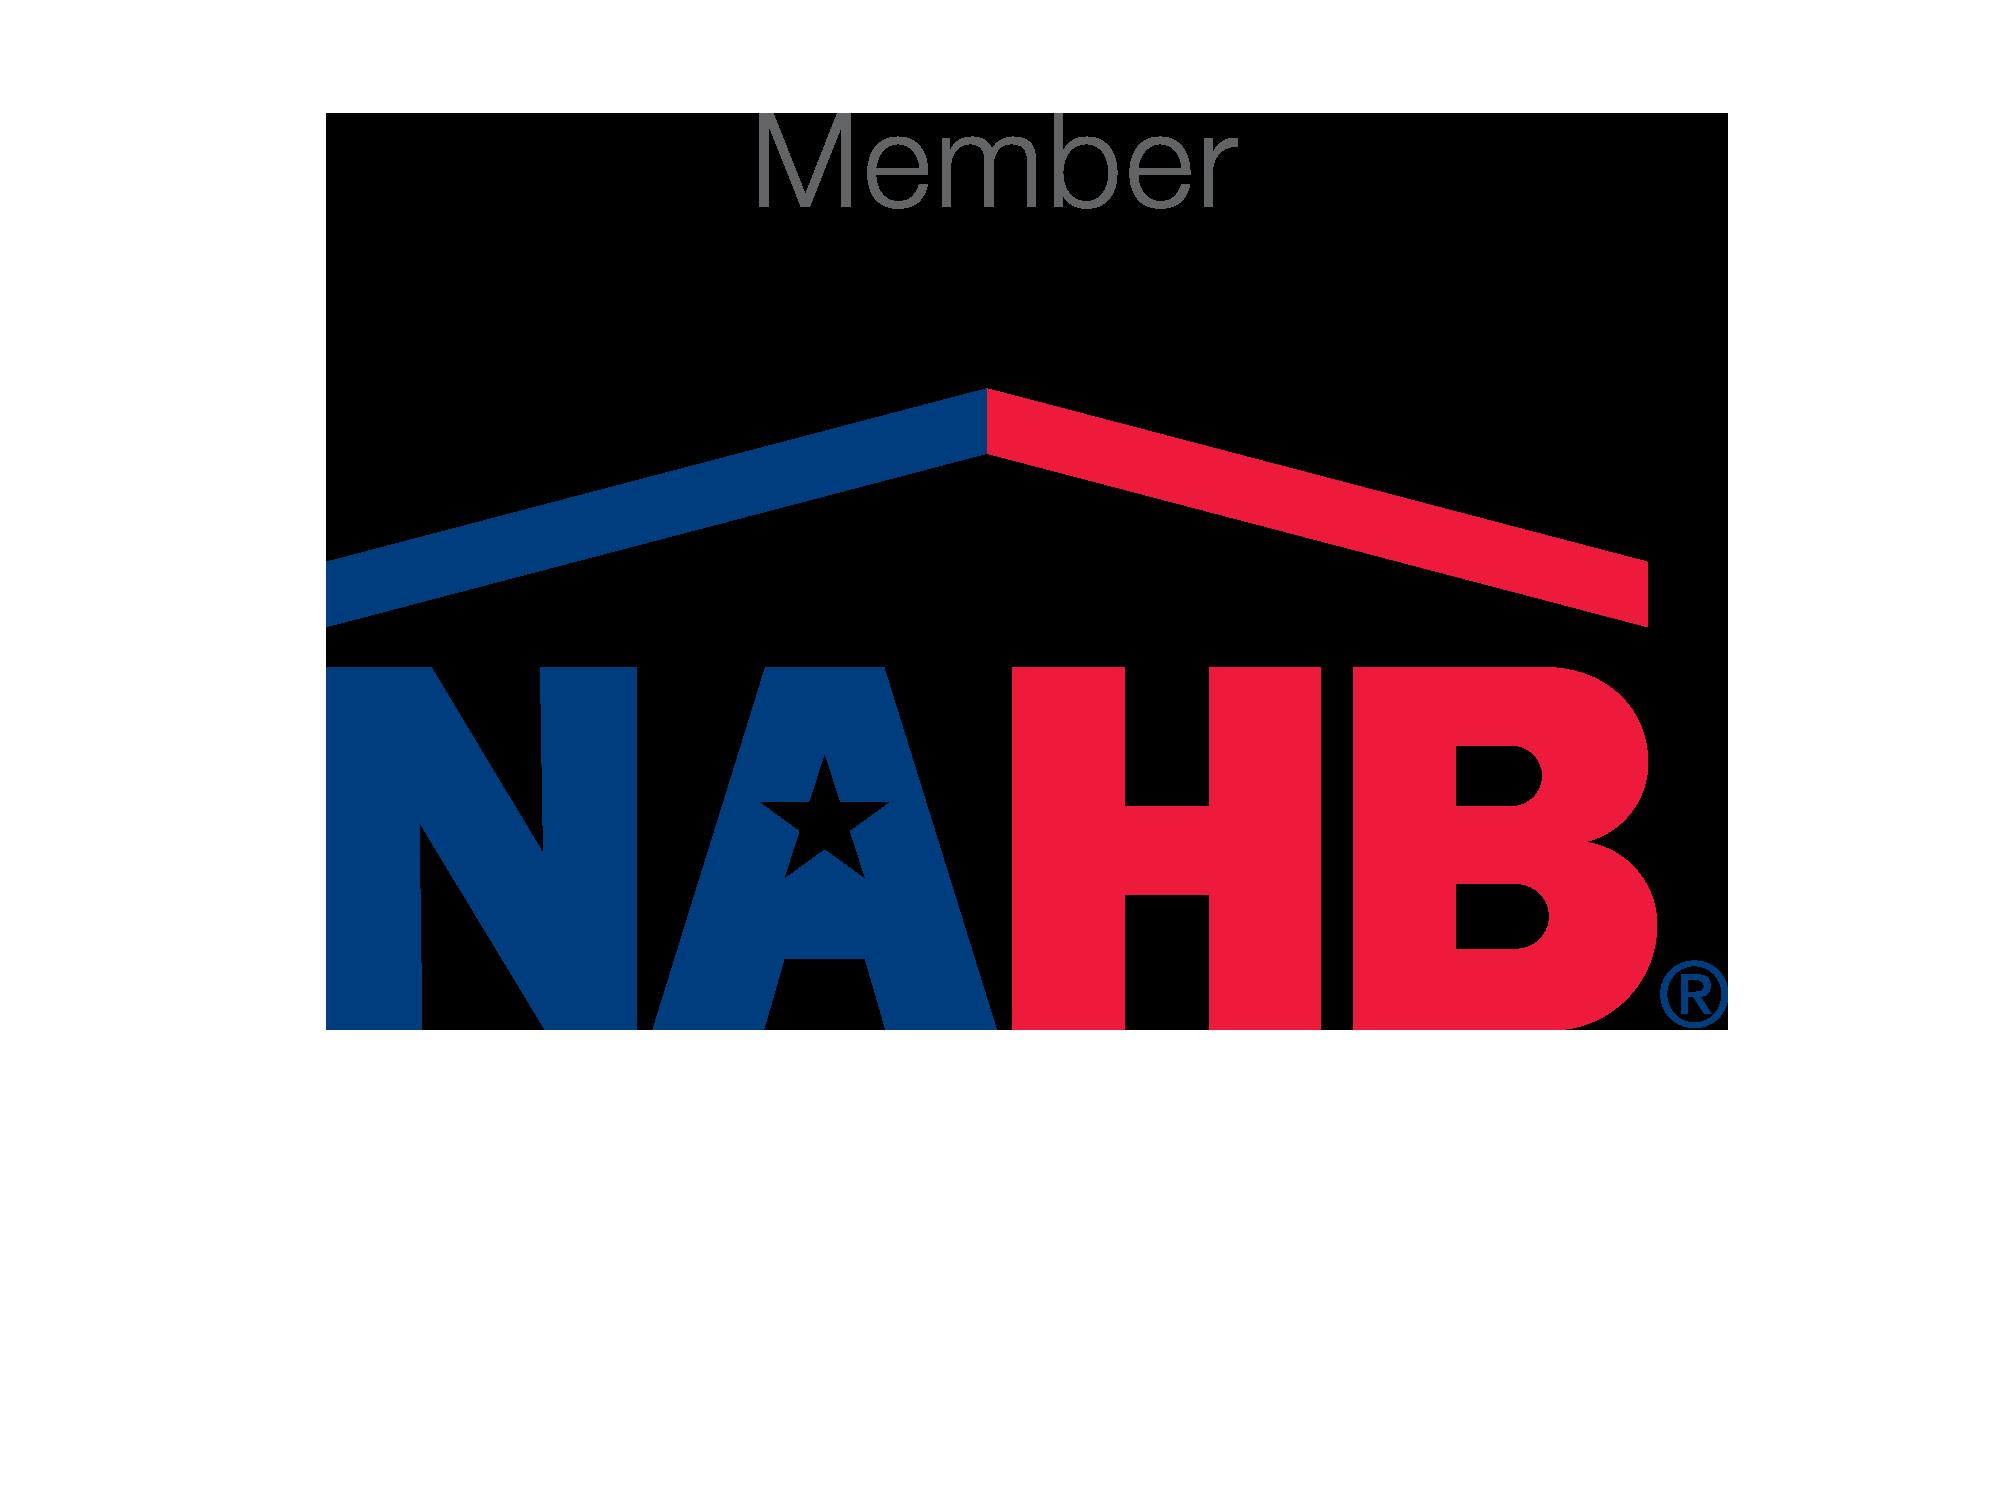 nahb-1.png